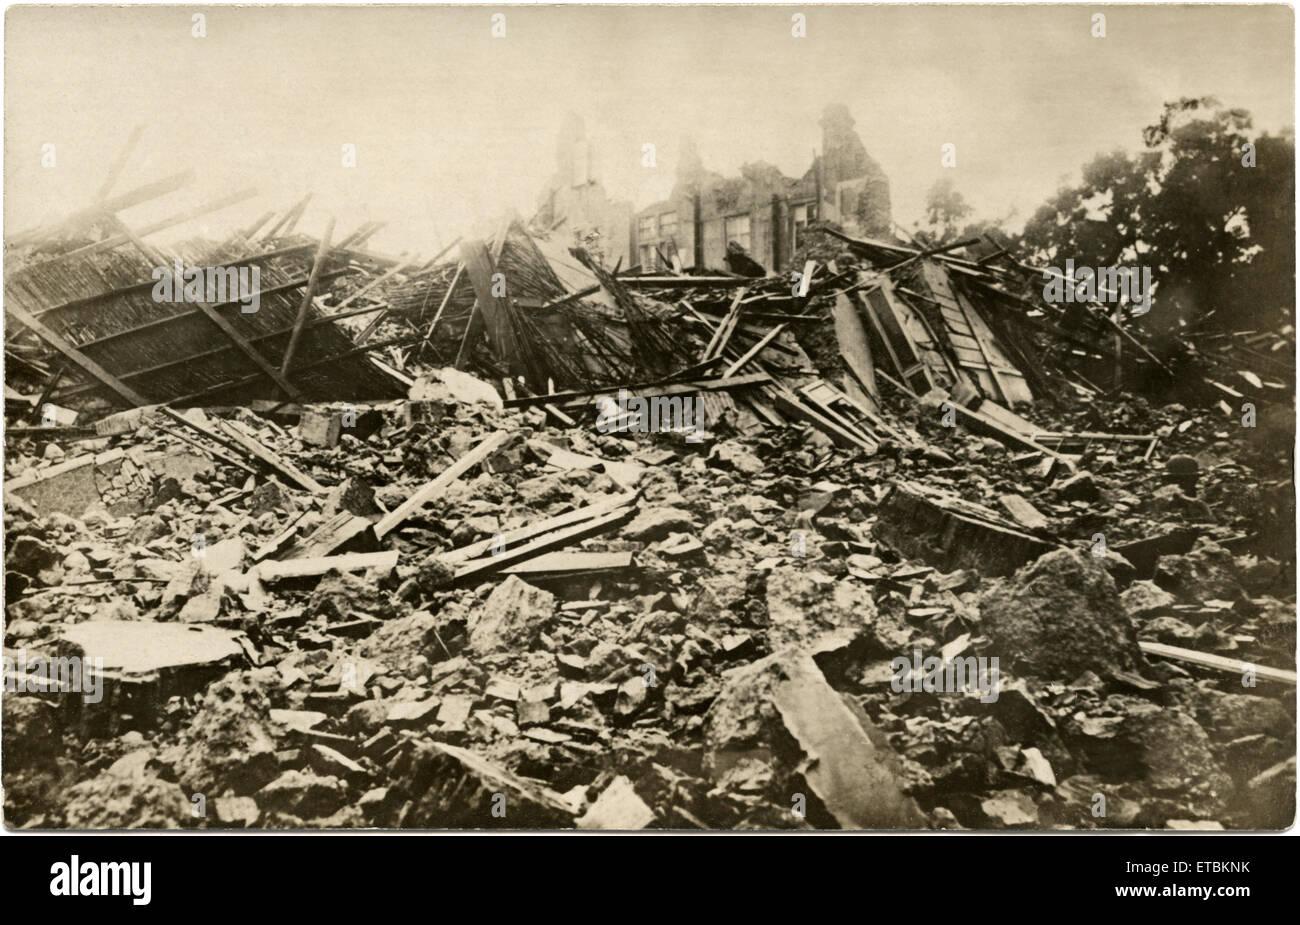 Earthquake Ruins, Messina, Sicily, Postcard, 1908 - Stock Image